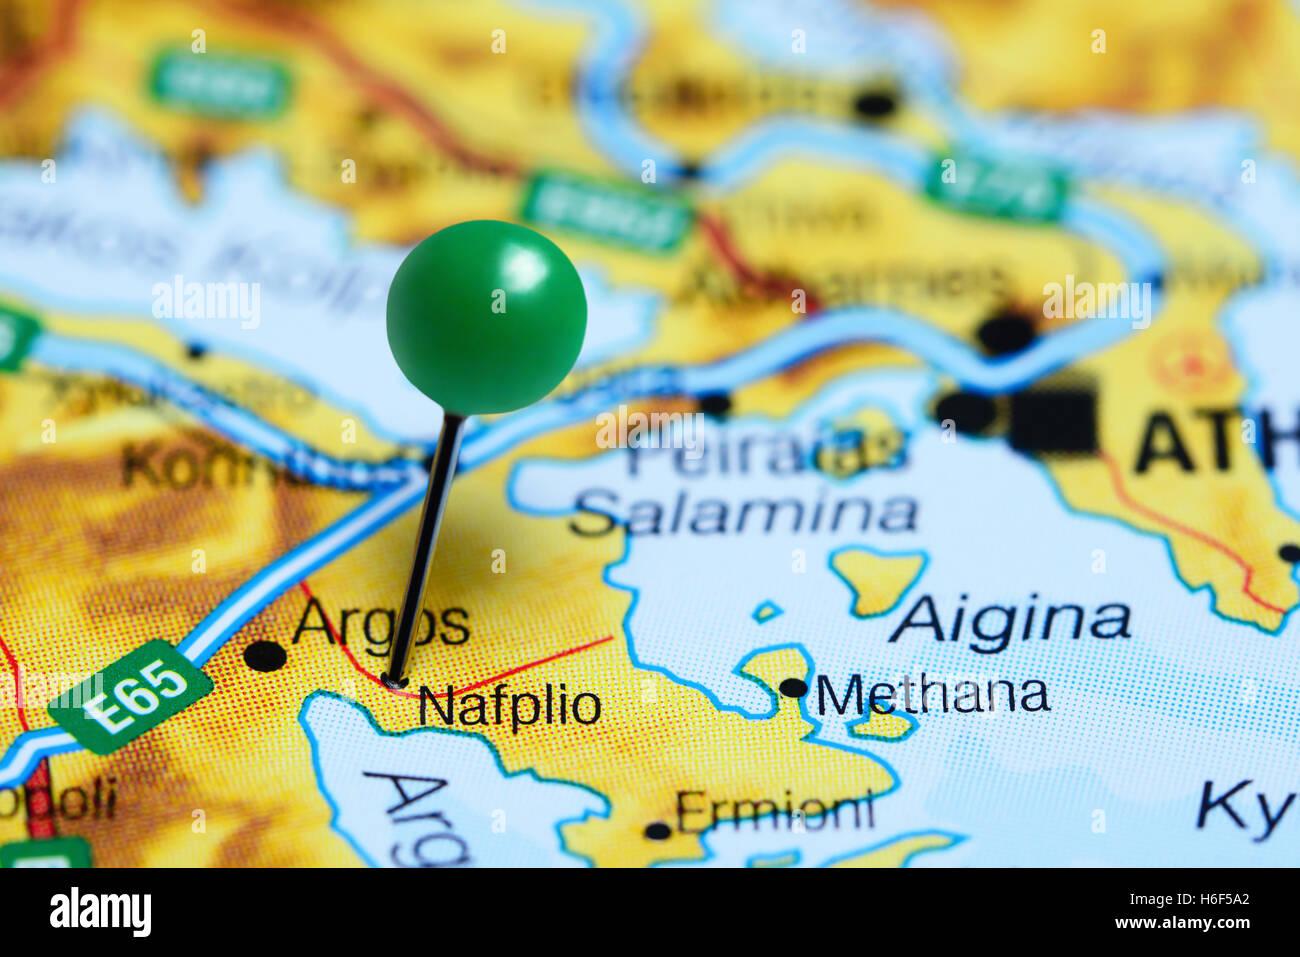 Nafplio Pinned On A Map Of Greece Stock Photo 124493994 Alamy